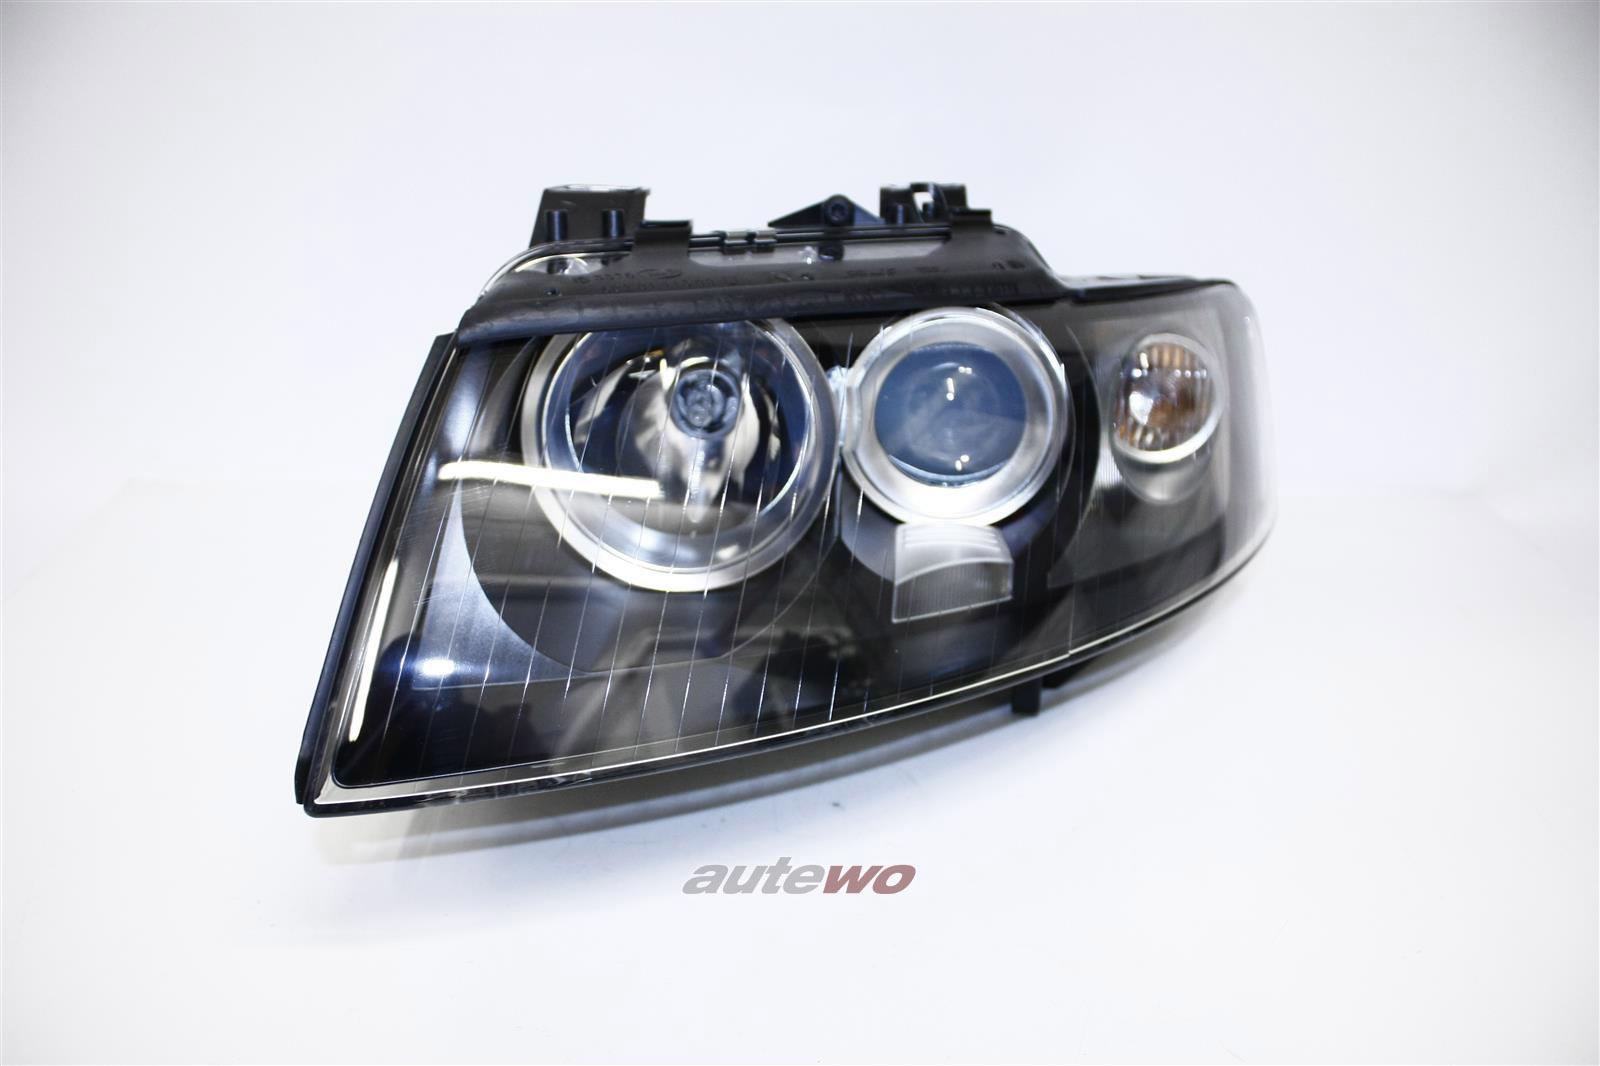 8H0941003AD 8H0941003Q NEU Audi A4 8H Cabrio Halogen-Scheinwerfer RHD B-Ware